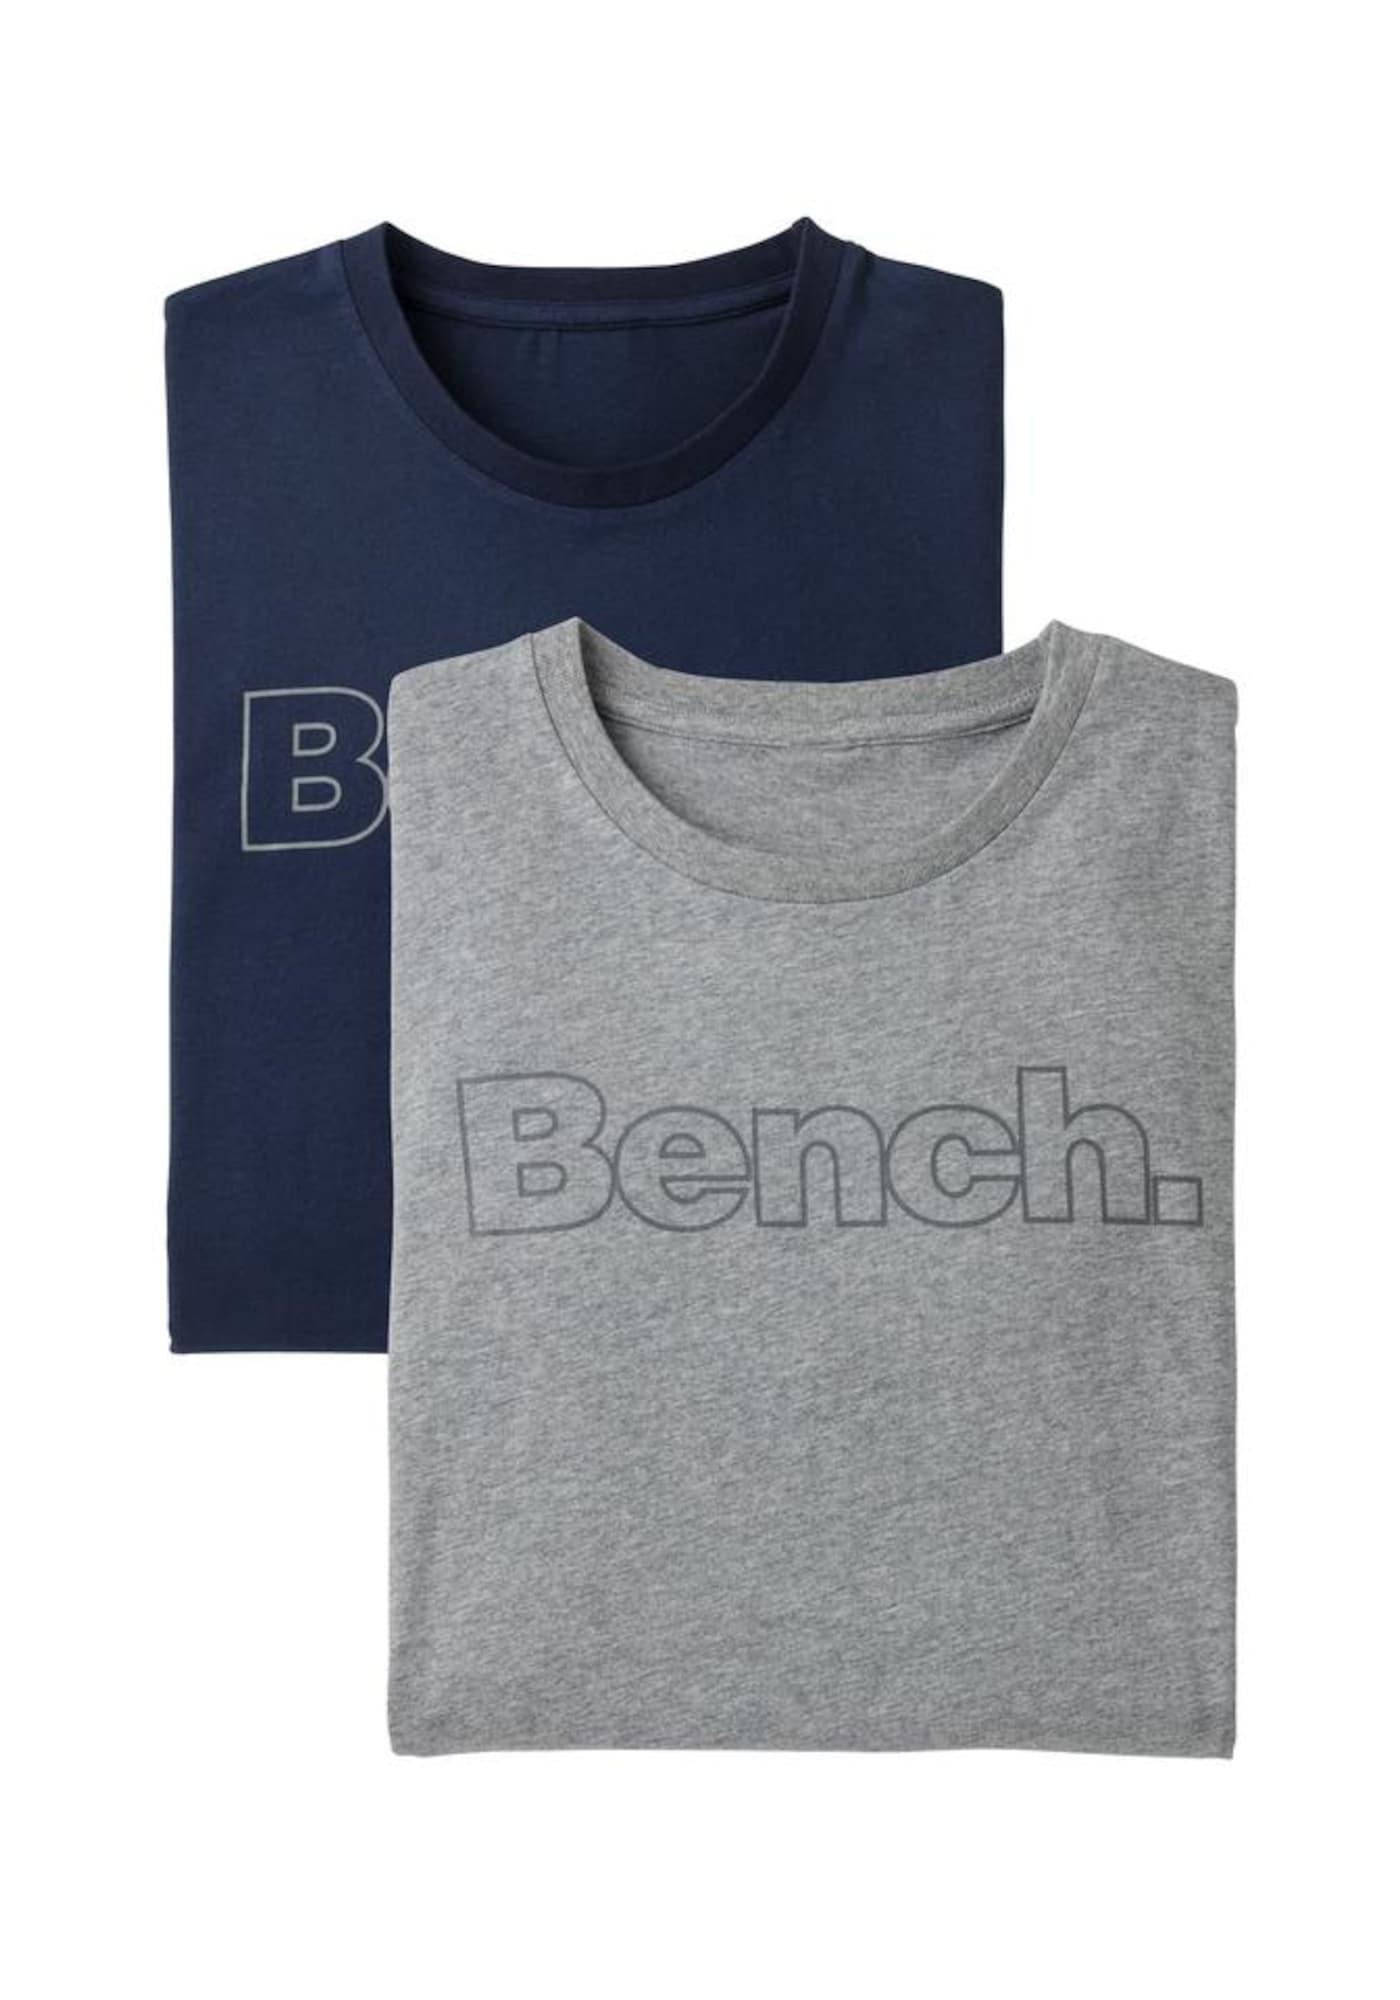 BENCH Marškinėliai margai mėlyna / margai pilka